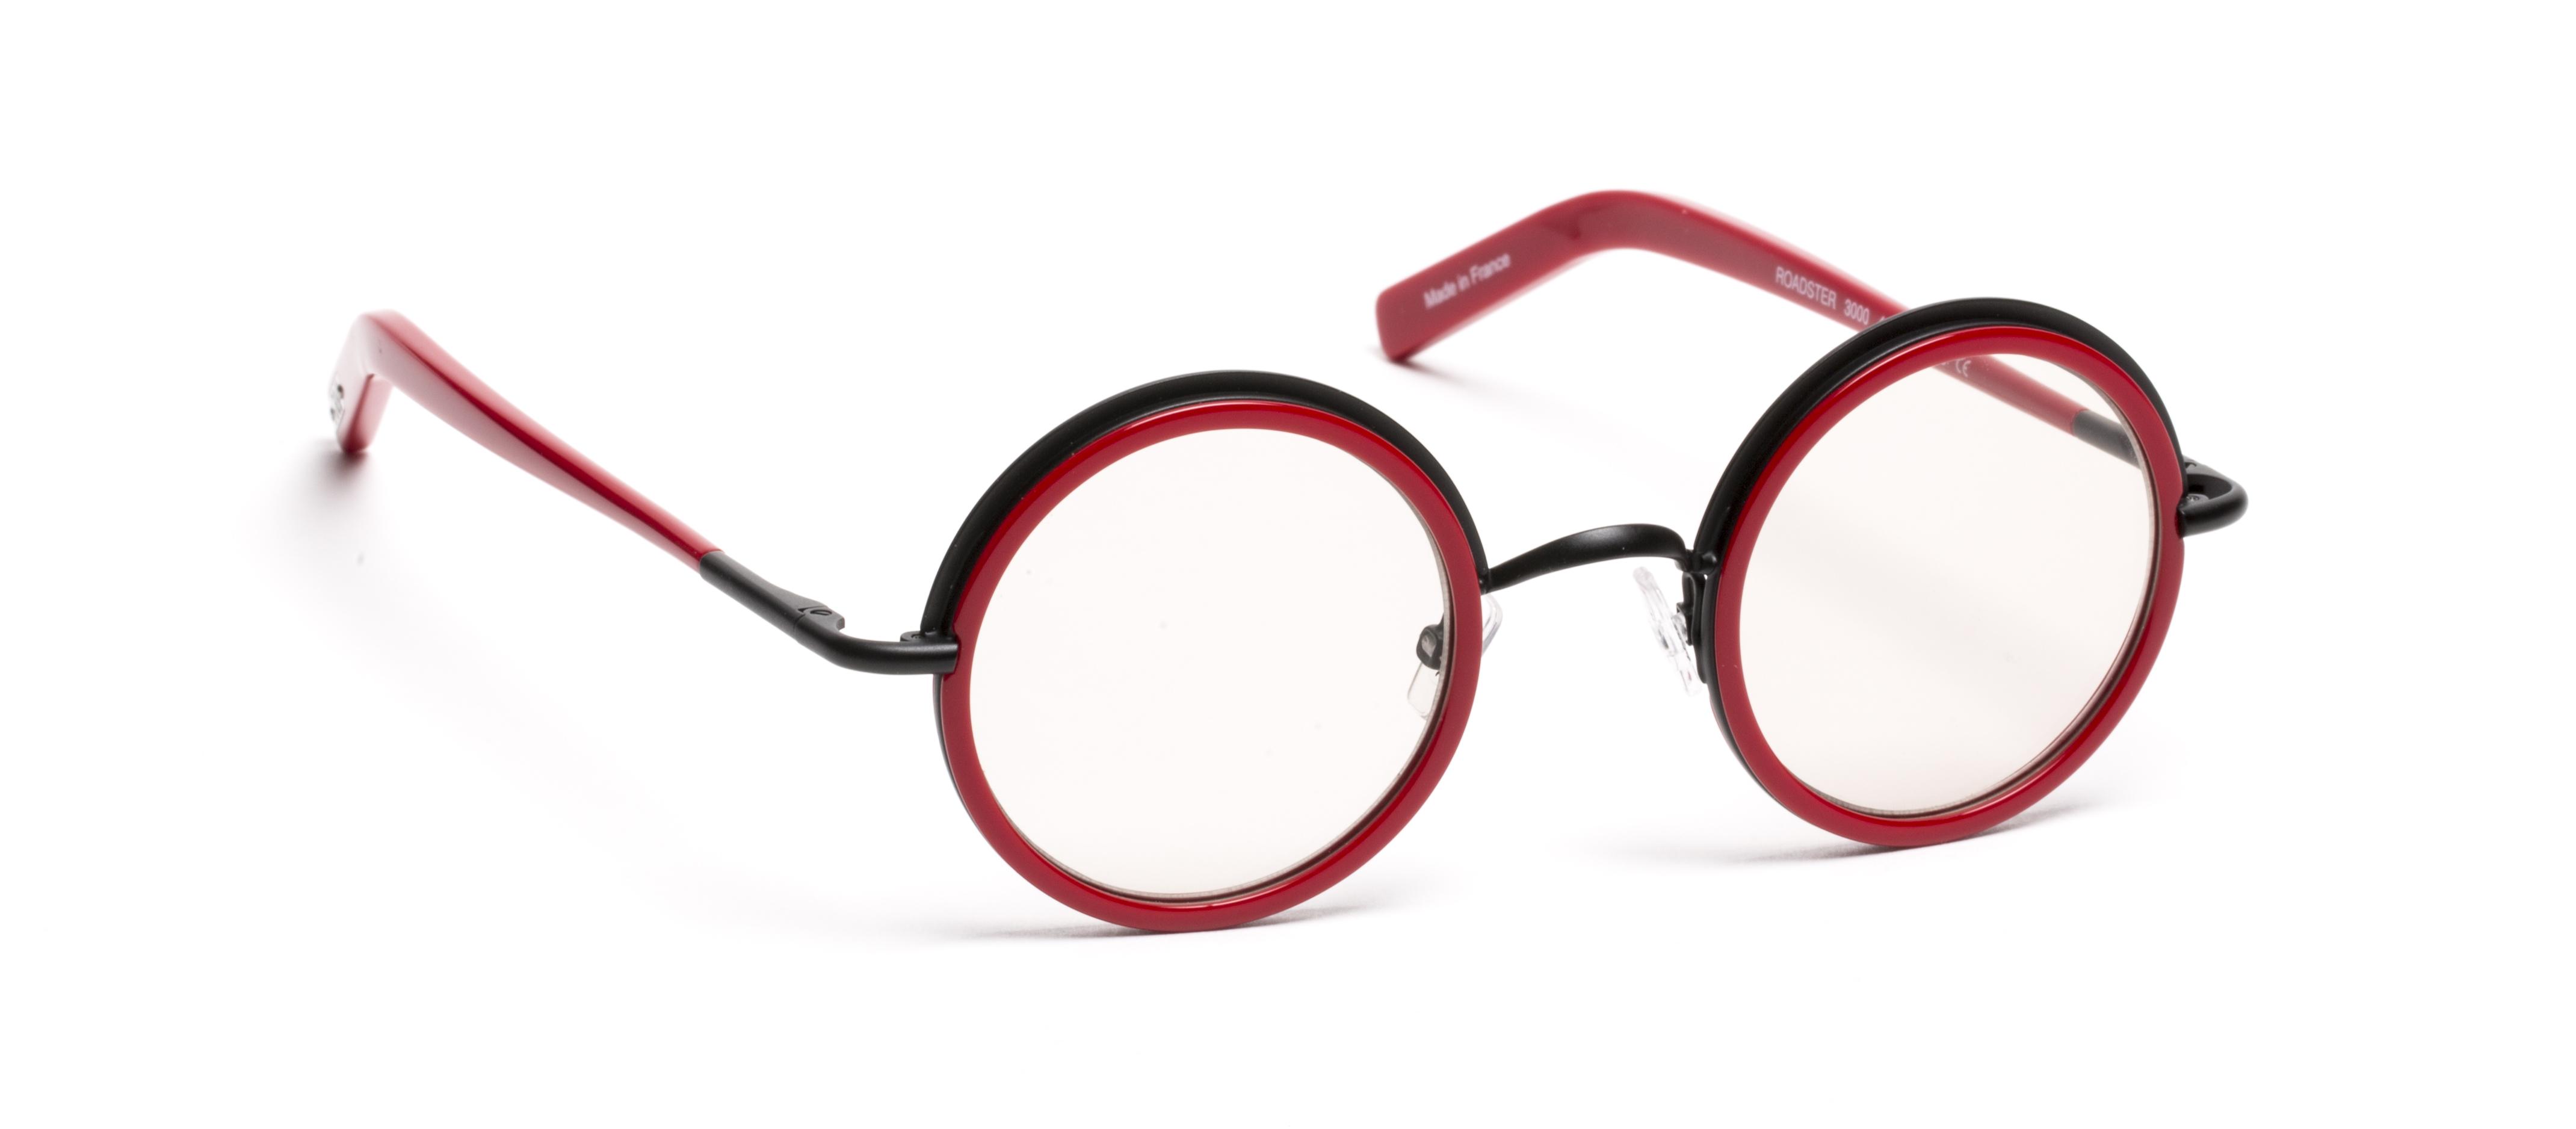 Eyeware Brands Glasses